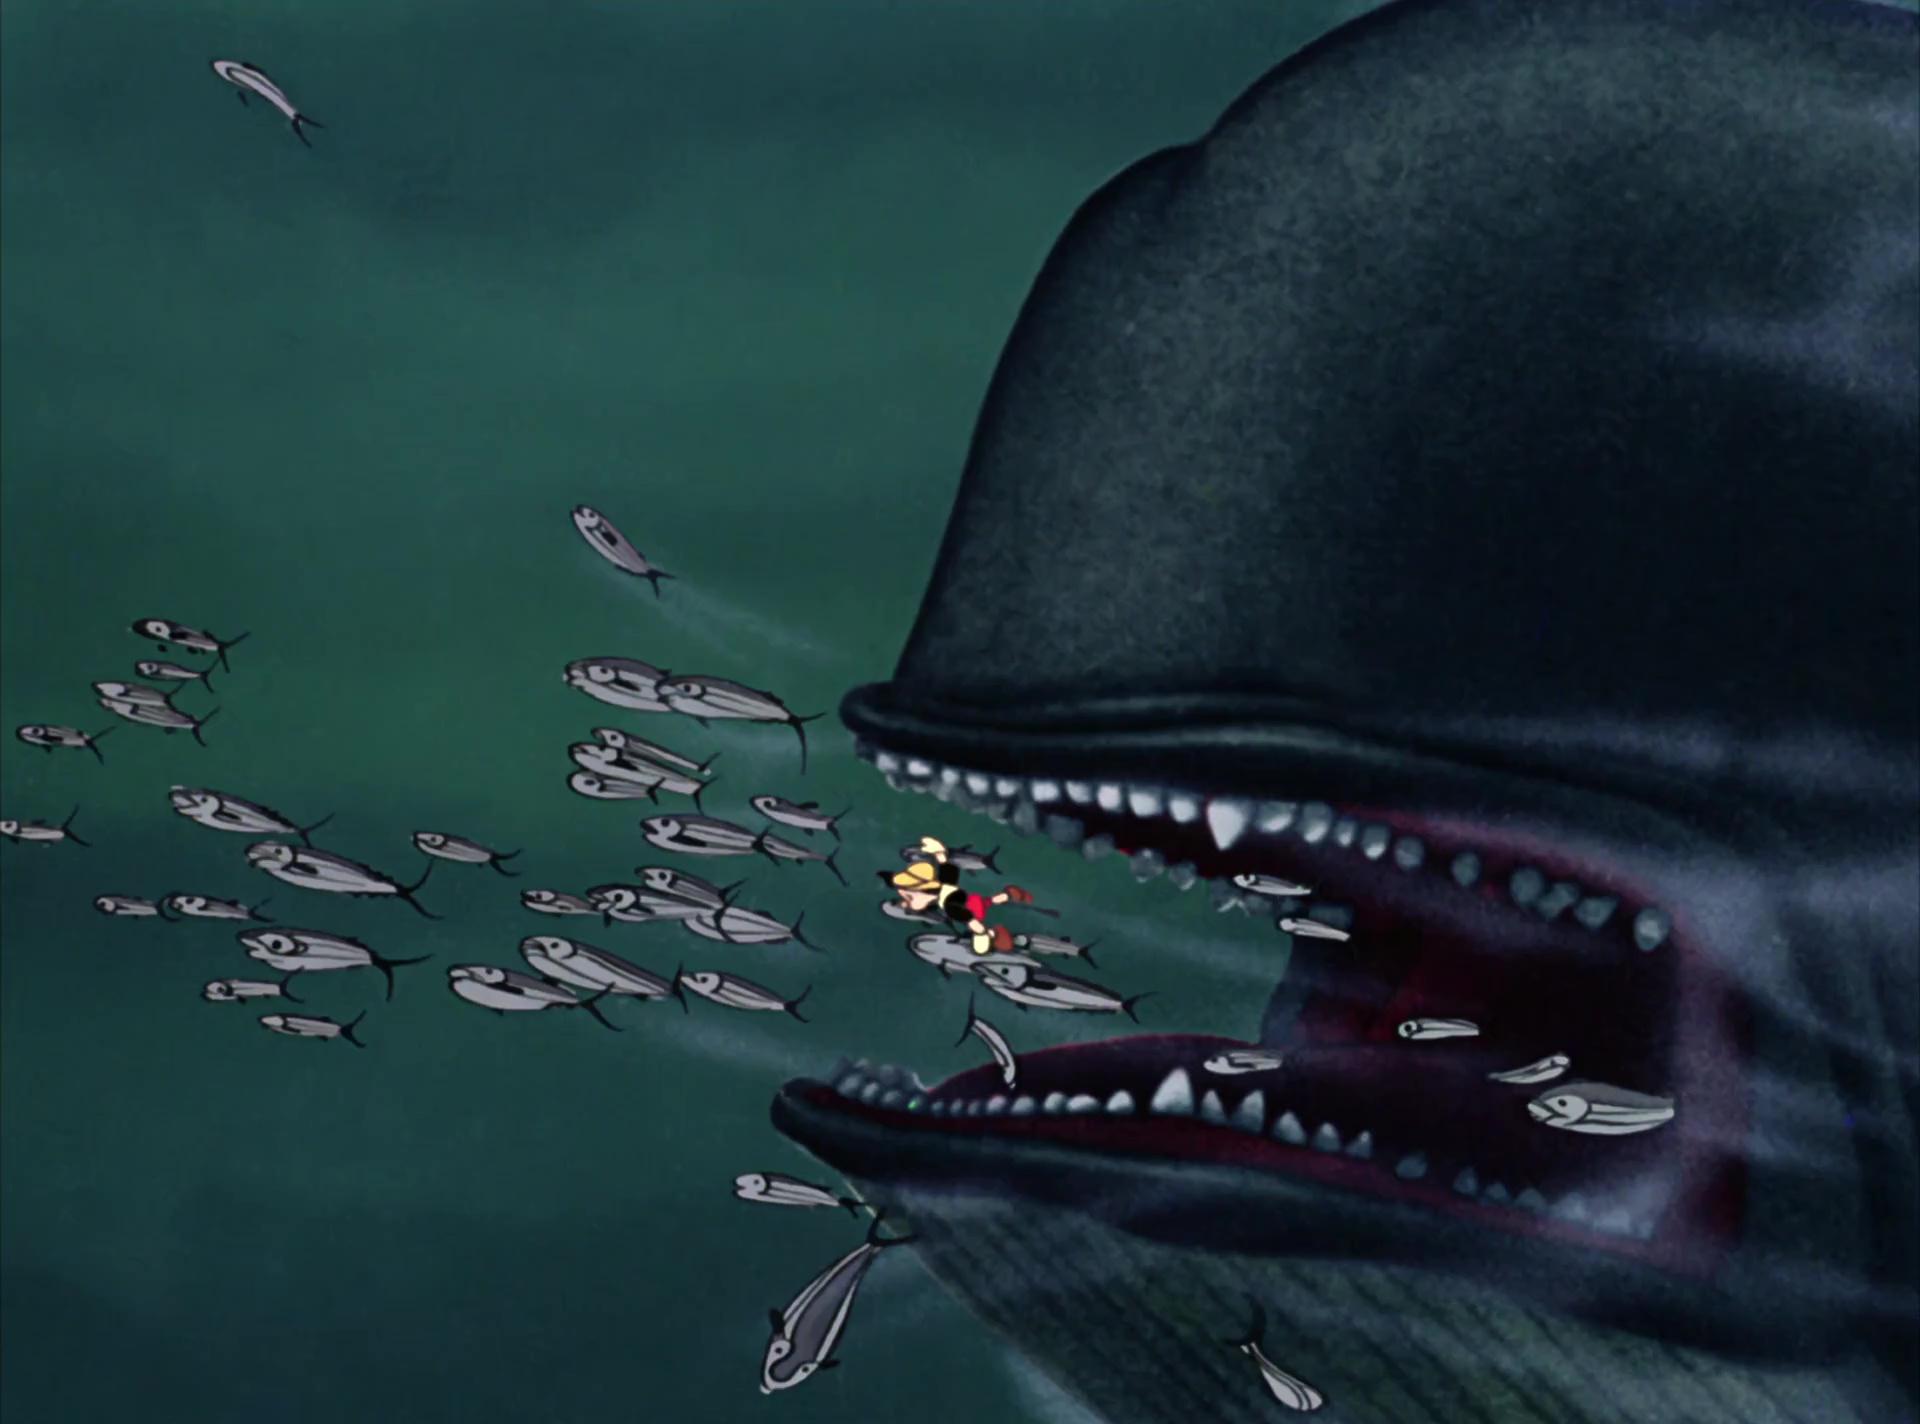 Monstro personnage dans pinocchio disney planet - Baleine pinocchio ...